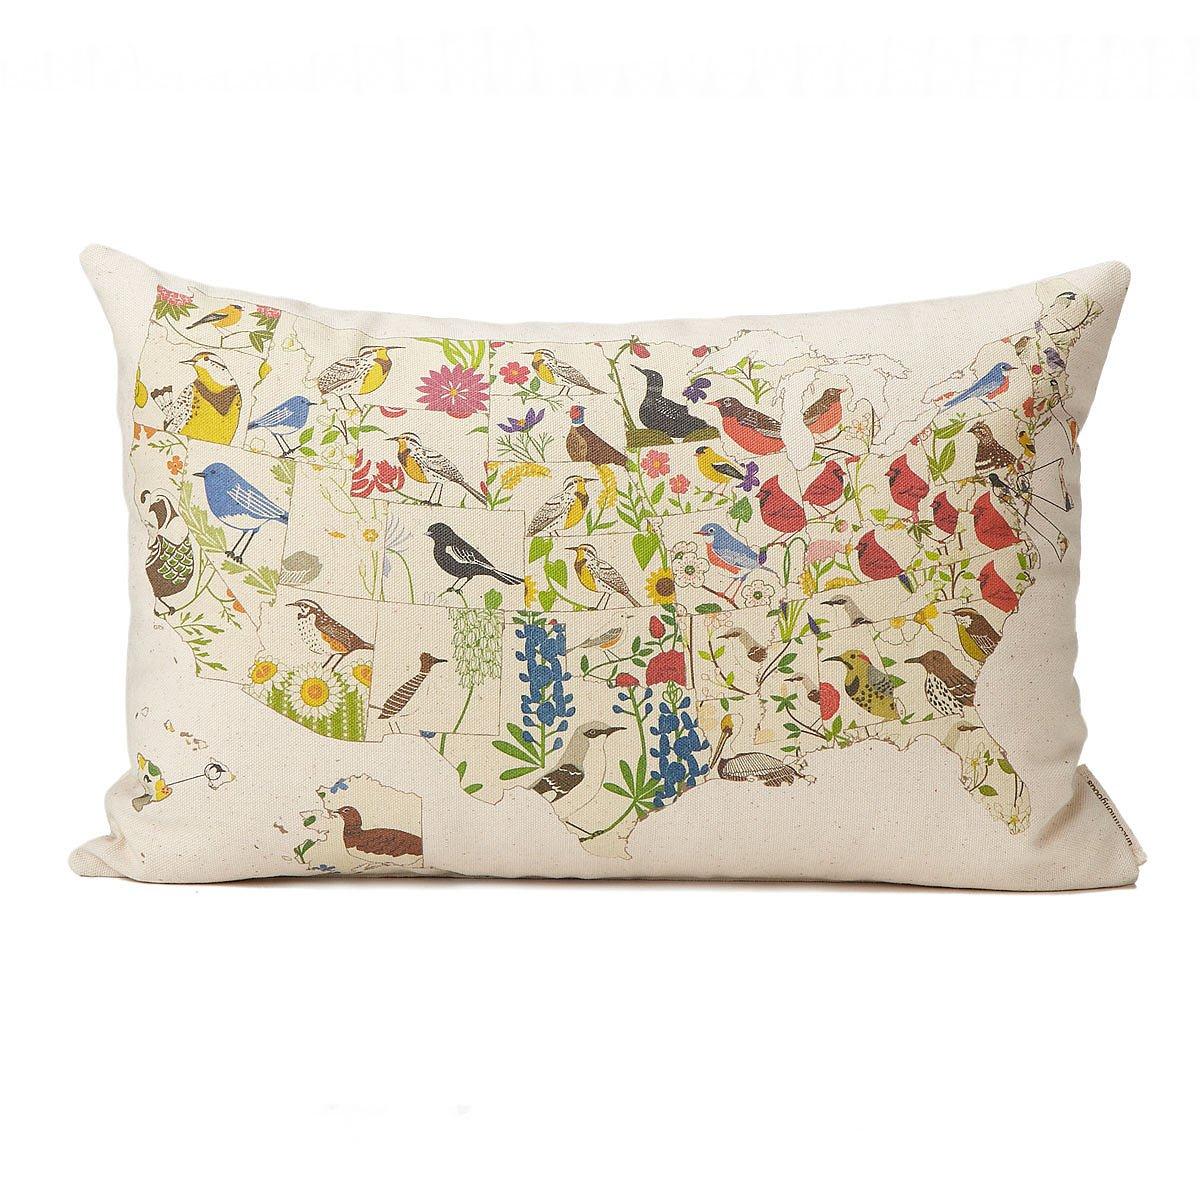 birds and blooms pillows us map 1 thumbnail